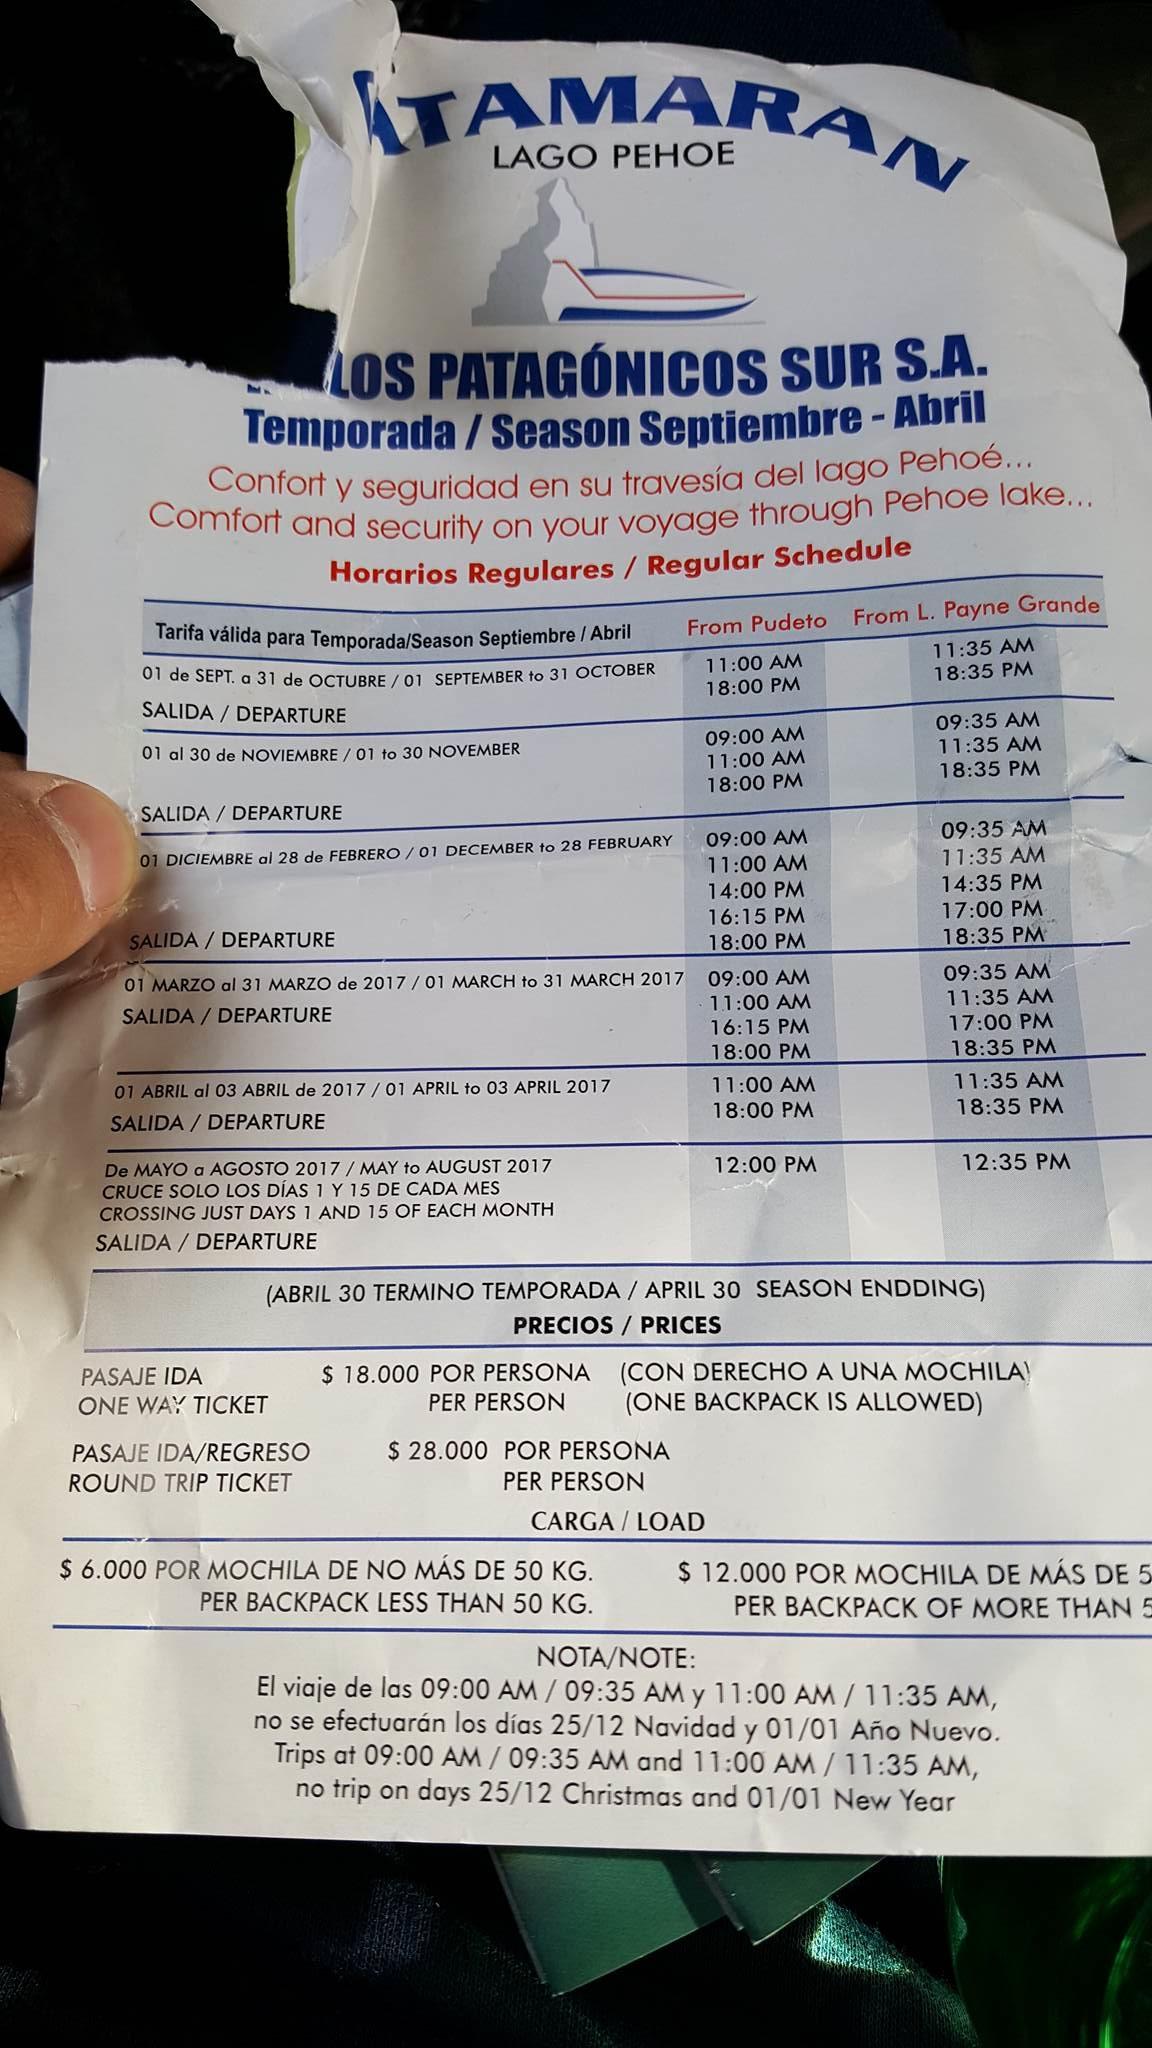 Torres del Piane Park Catamaran timetable